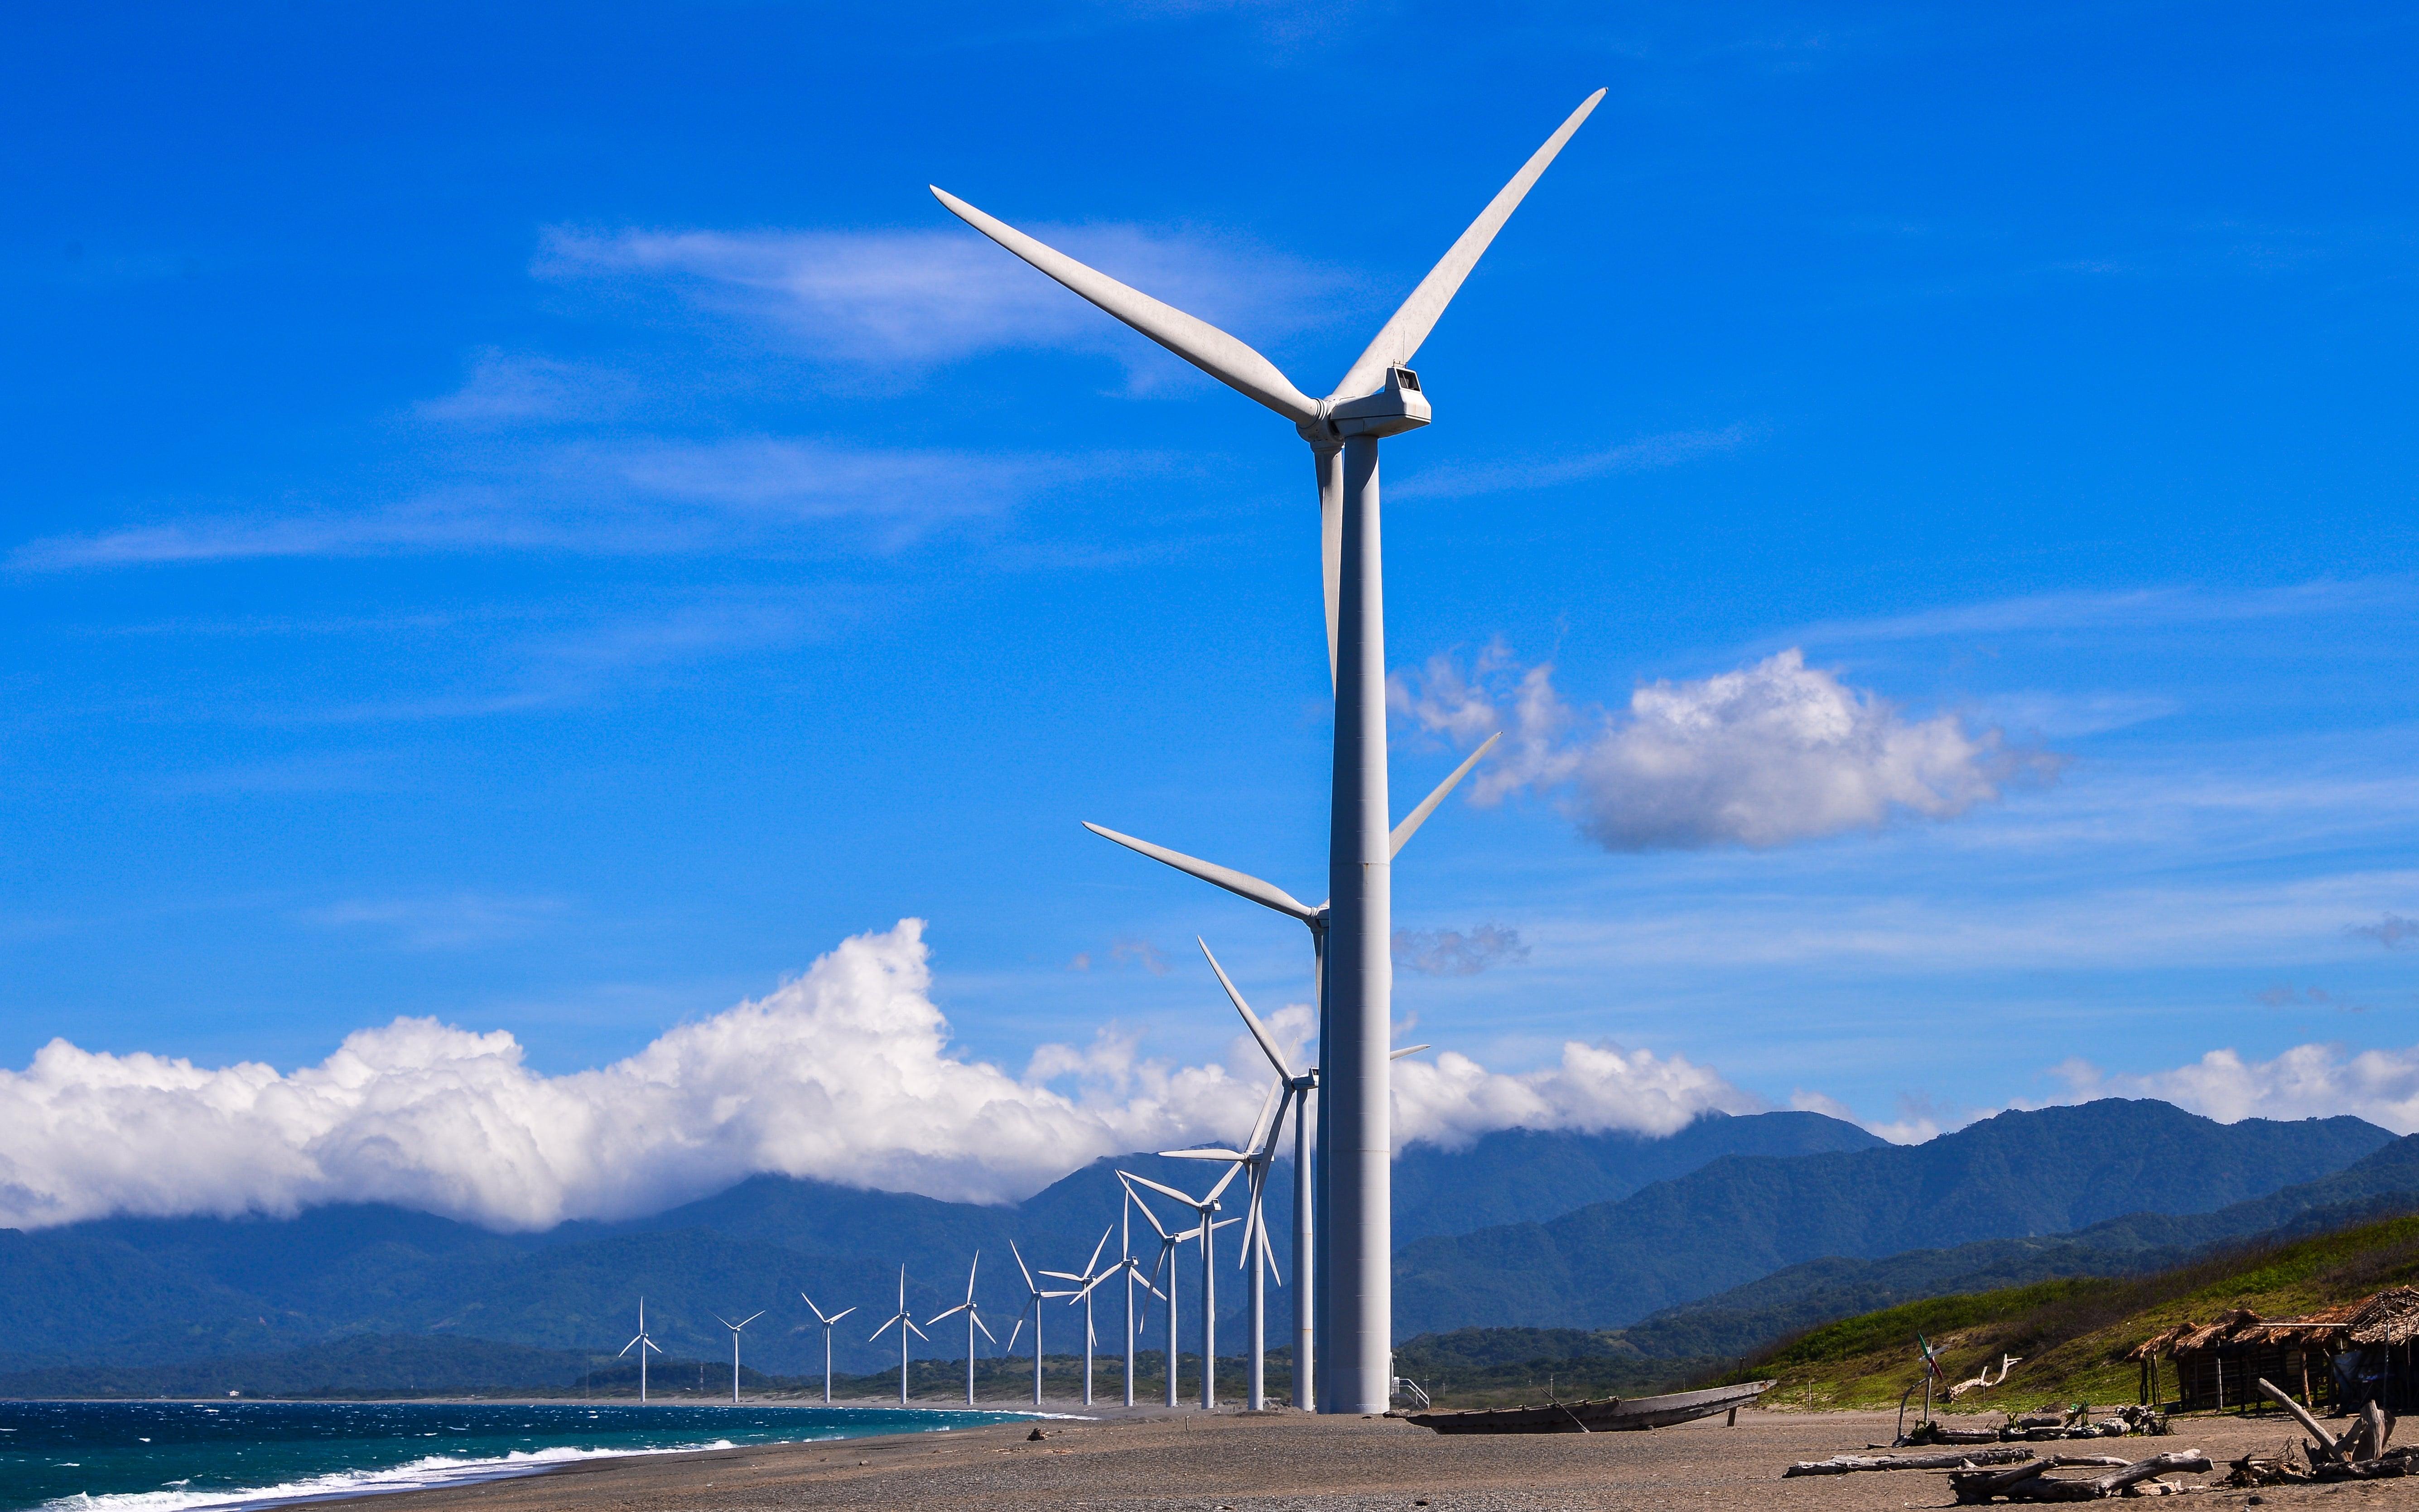 Wind turbines of Bangui Windmills in Pagudpud